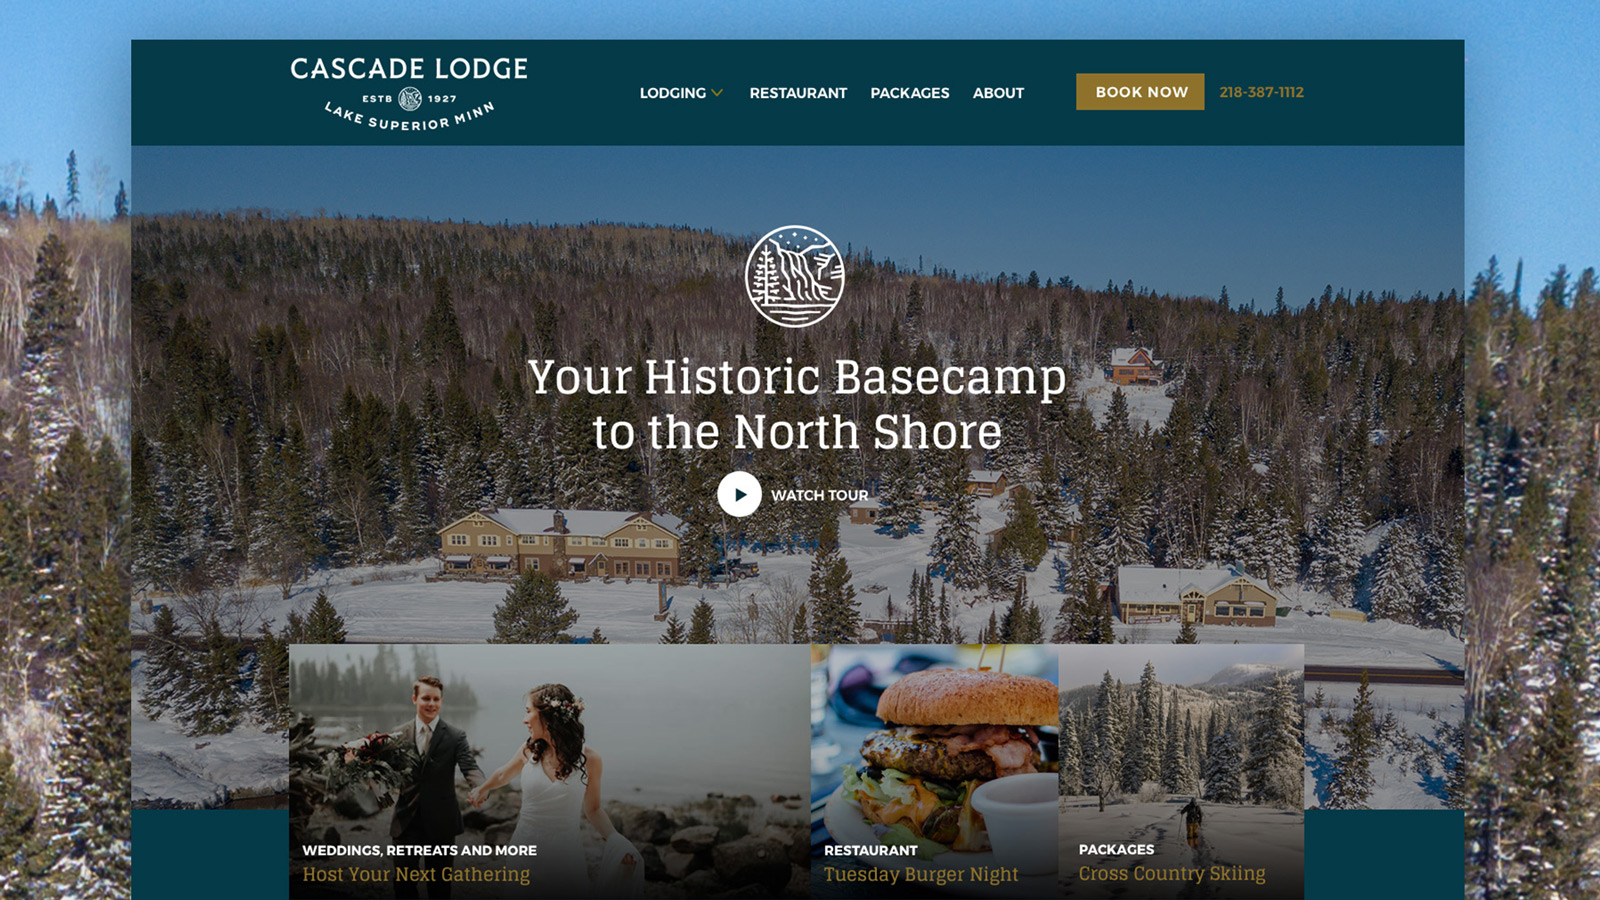 Cascade Lodge Lake Superior Website Design